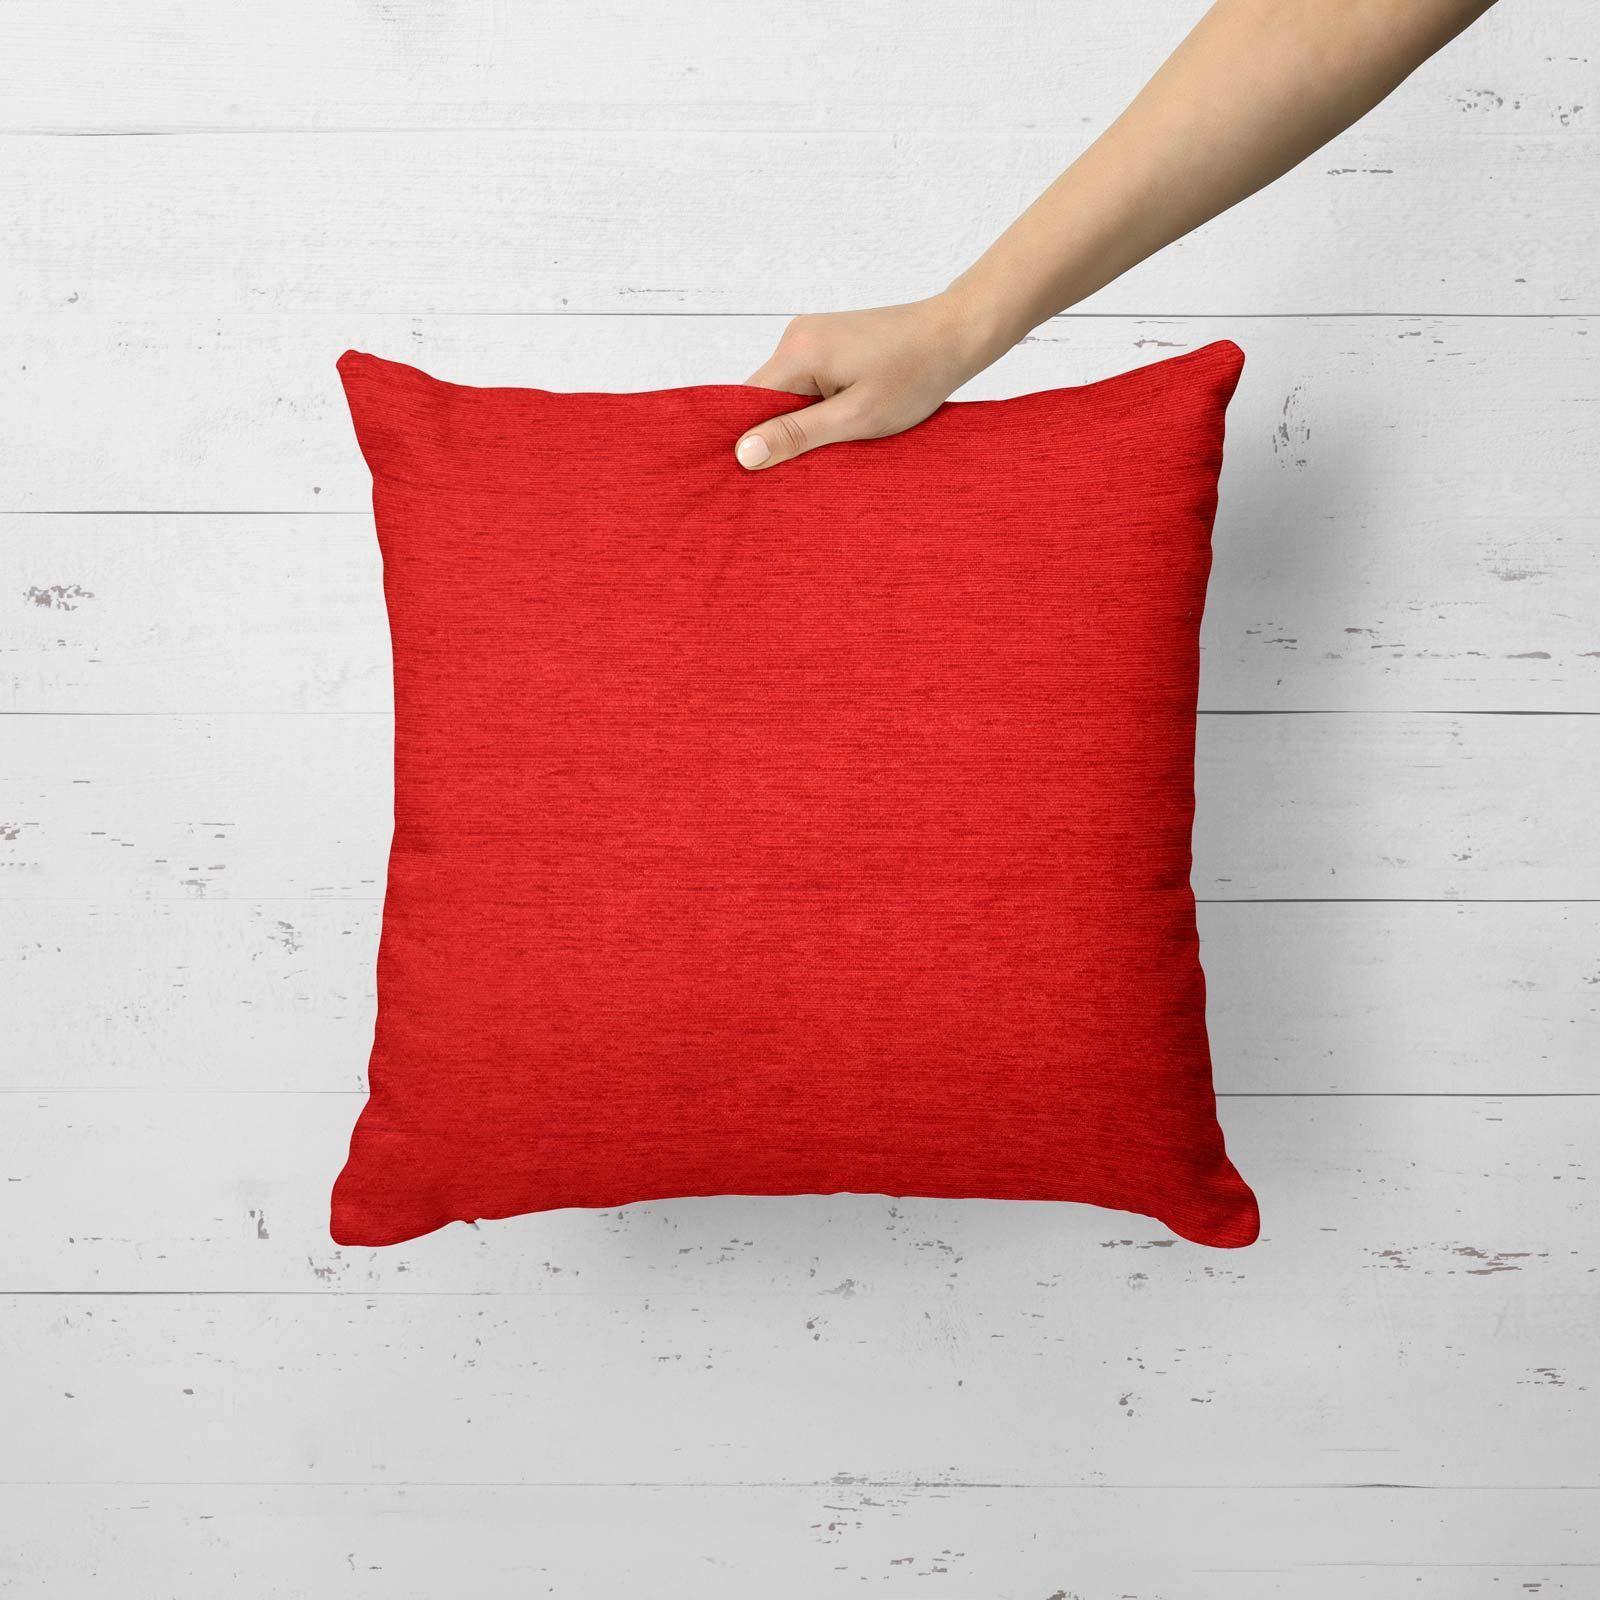 Vino-Tinto-Cushion-Covers-Coleccion-17-034-18-034-43cm-45cm-Cubierta miniatura 6